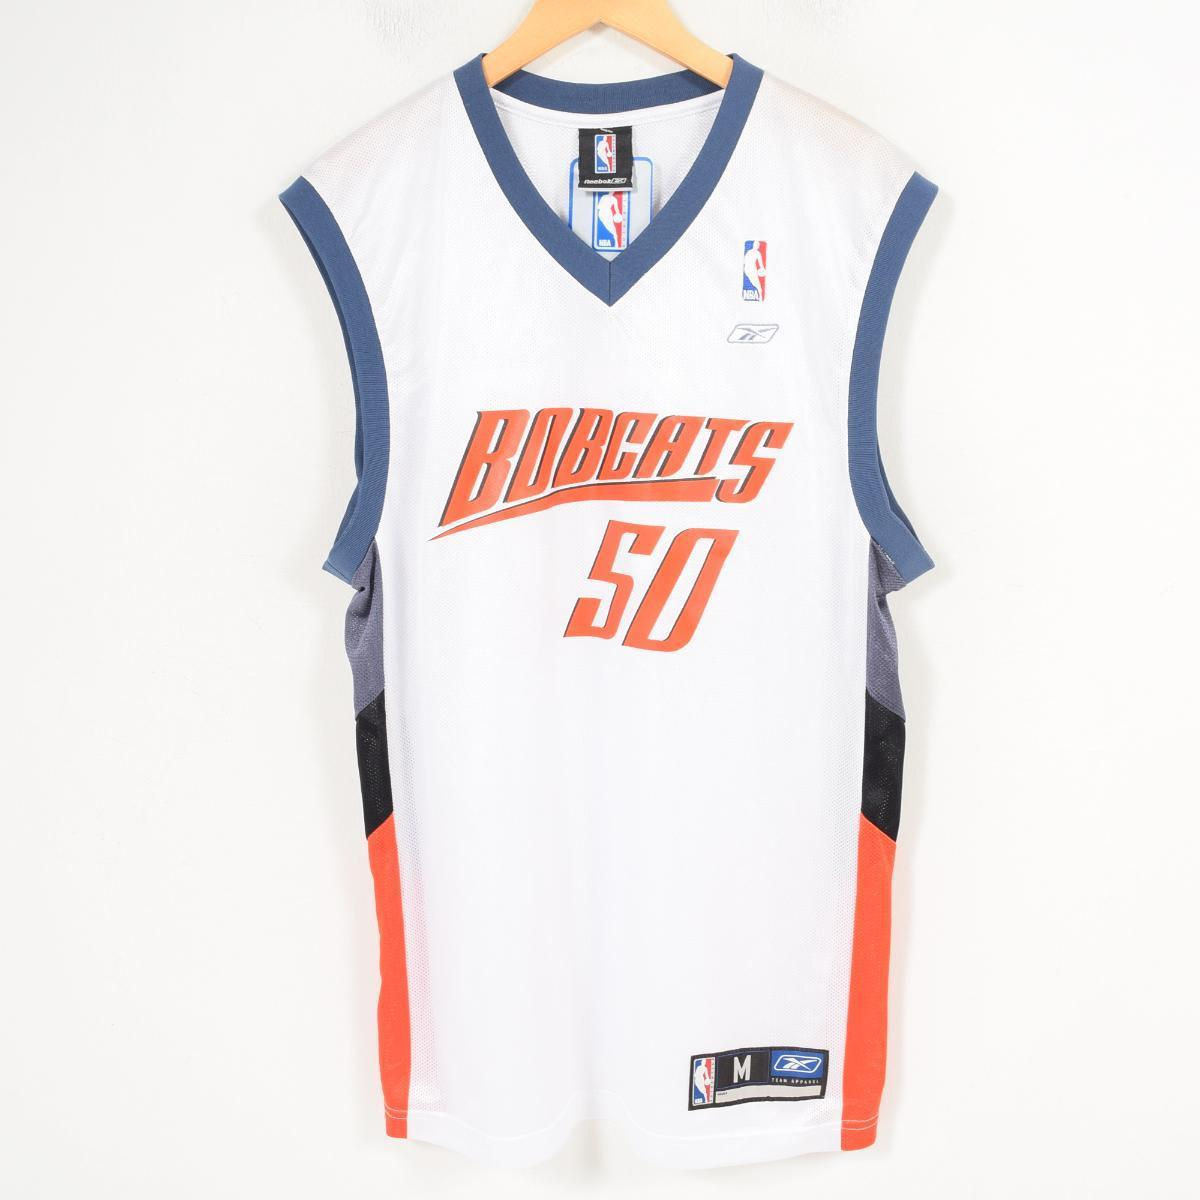 promo code 156a4 a72d9 DEADSTOCK dead stock Reebok Reebok NBA CHARLOTTE BOBCSTS Charlotte Bobcats  game shirt replica uniform men M /wap0661